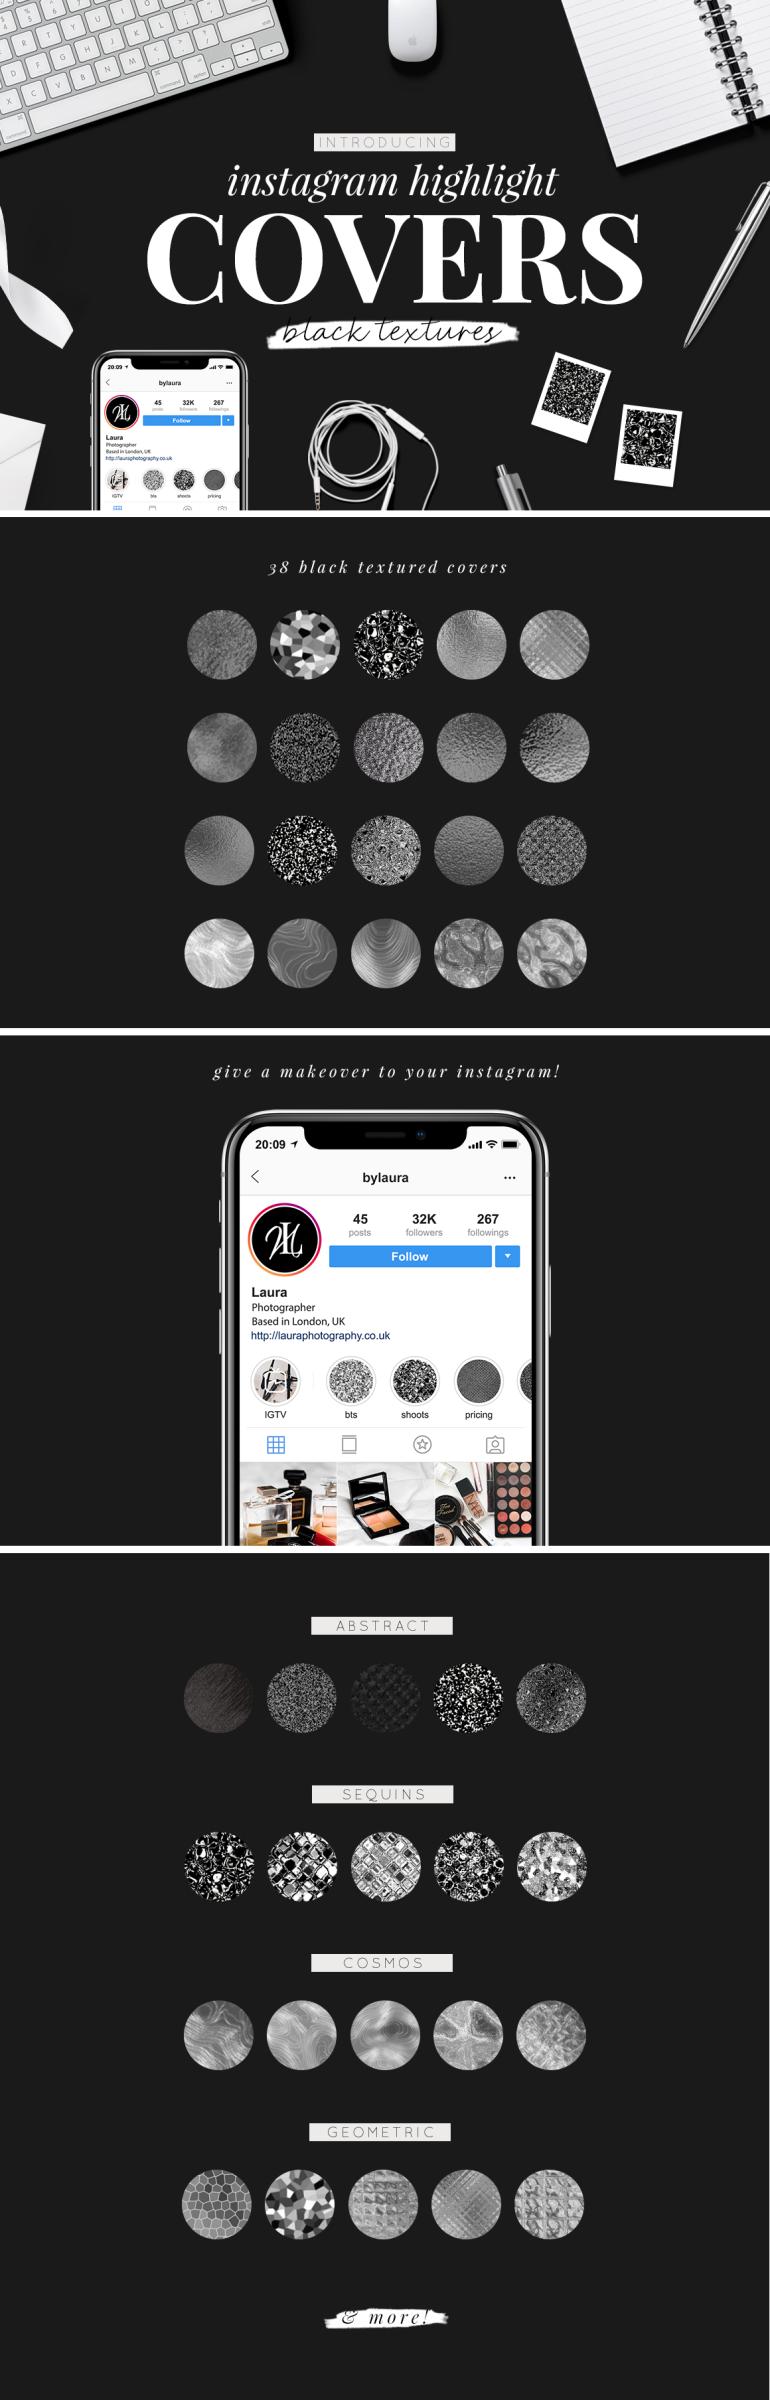 instagram highlight covers - black textures - new lune studio